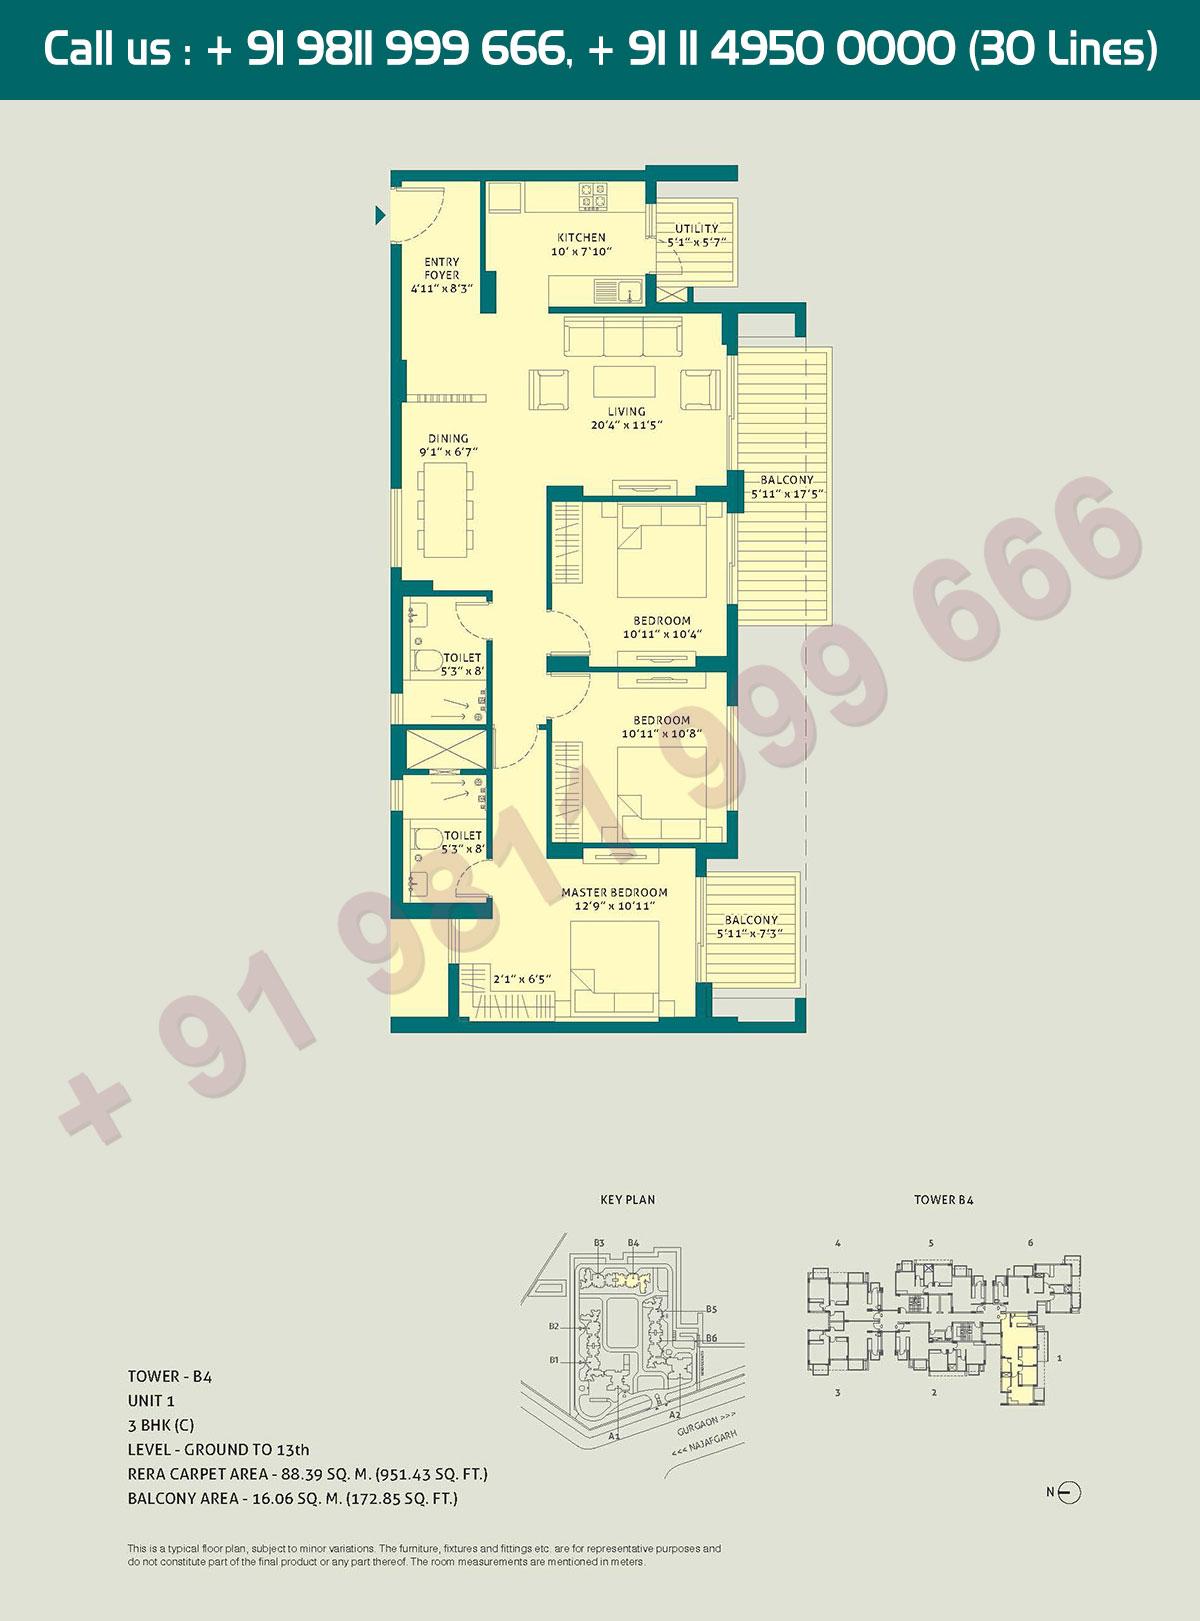 3 BHK - (C), Level Ground to 13, Unit - 1, Tower - B4